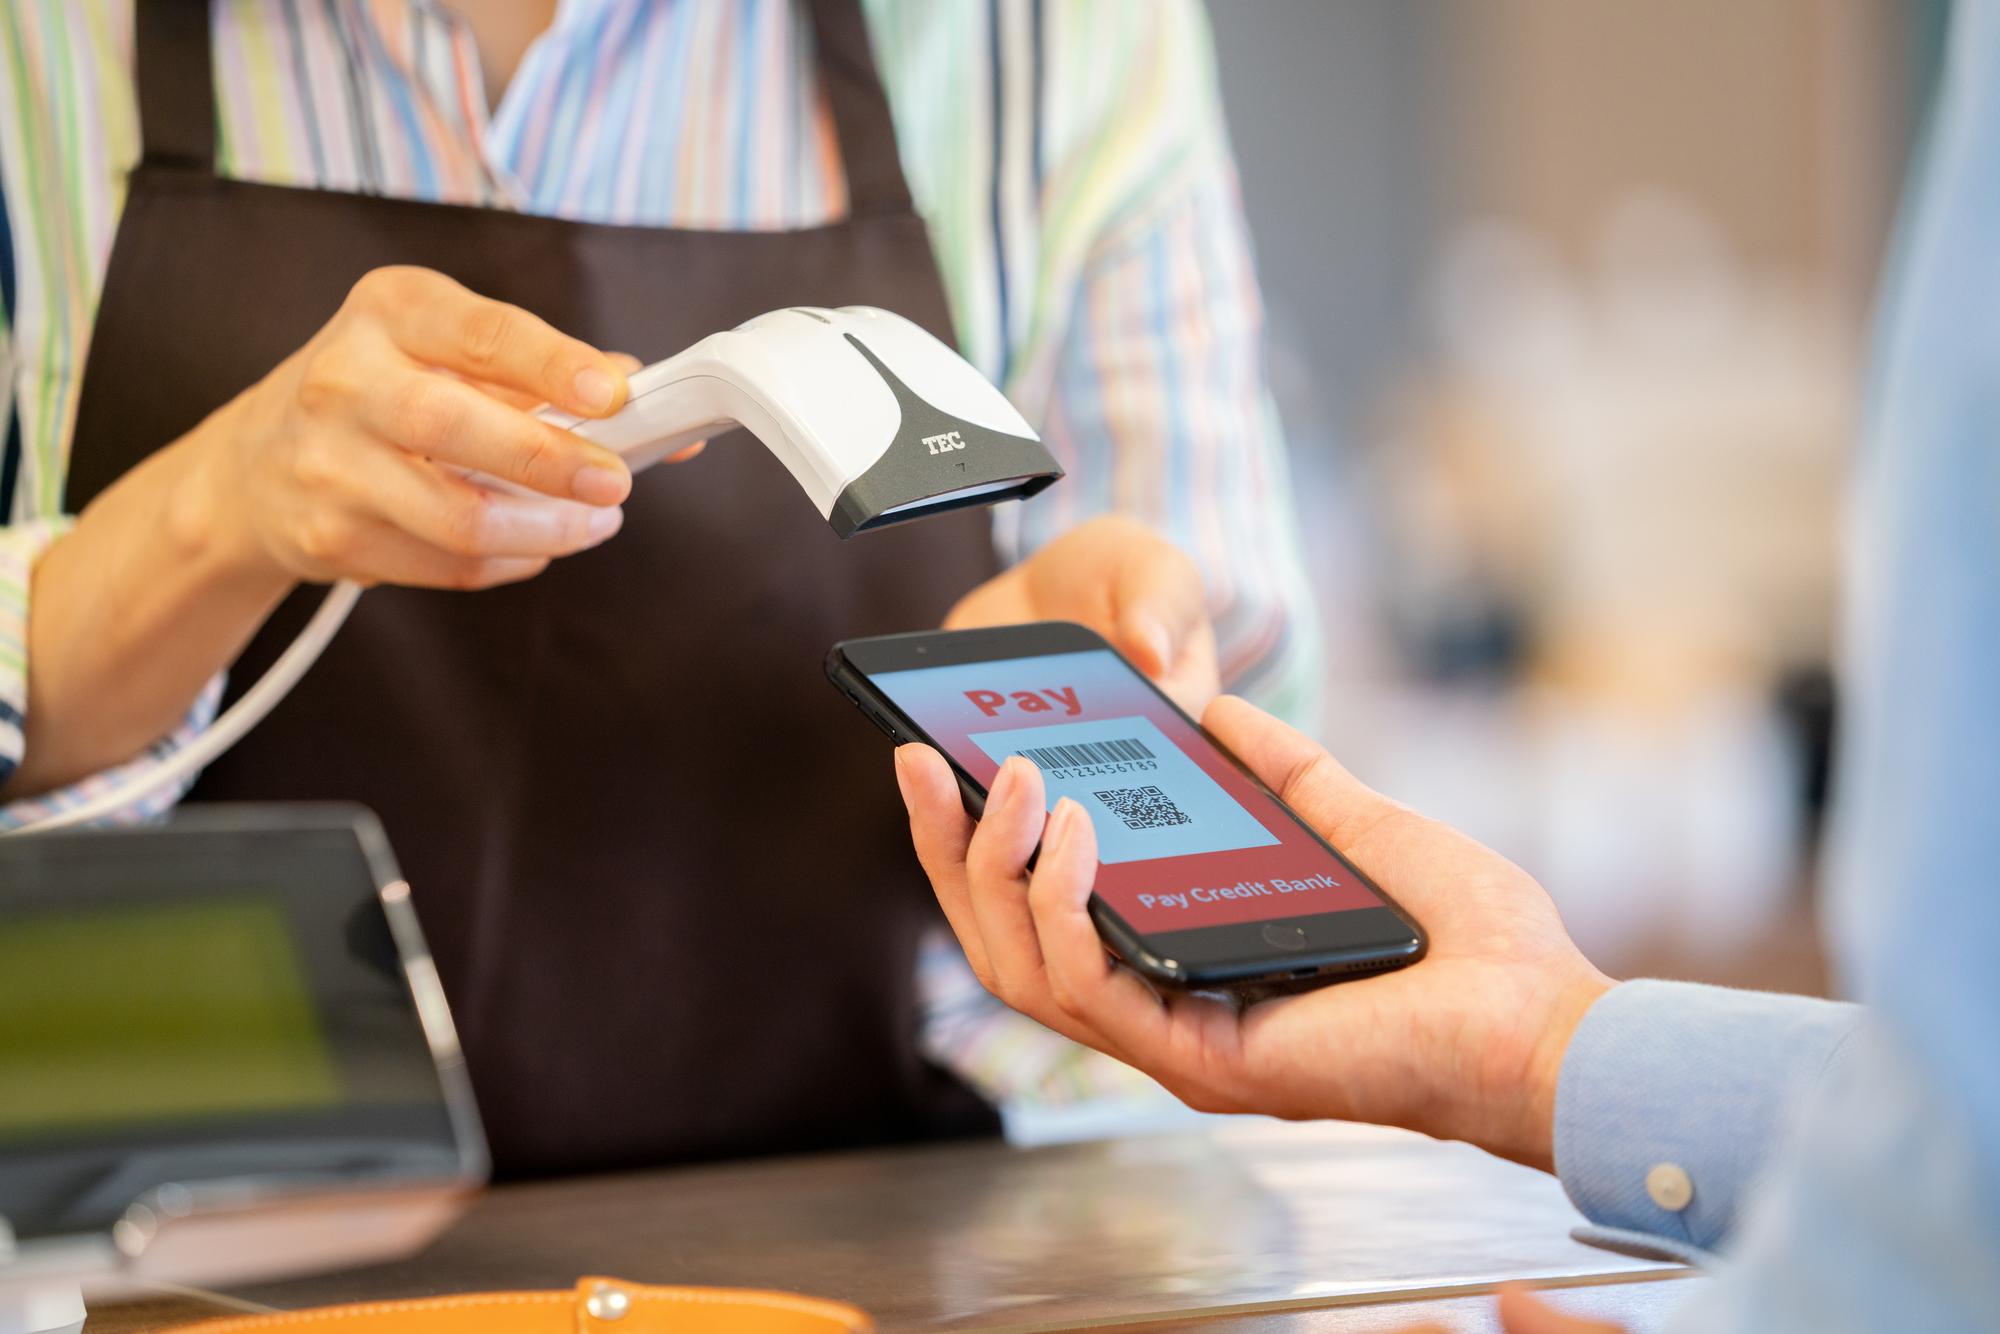 getting a credit card in japan as a foreigner  tsunagu local